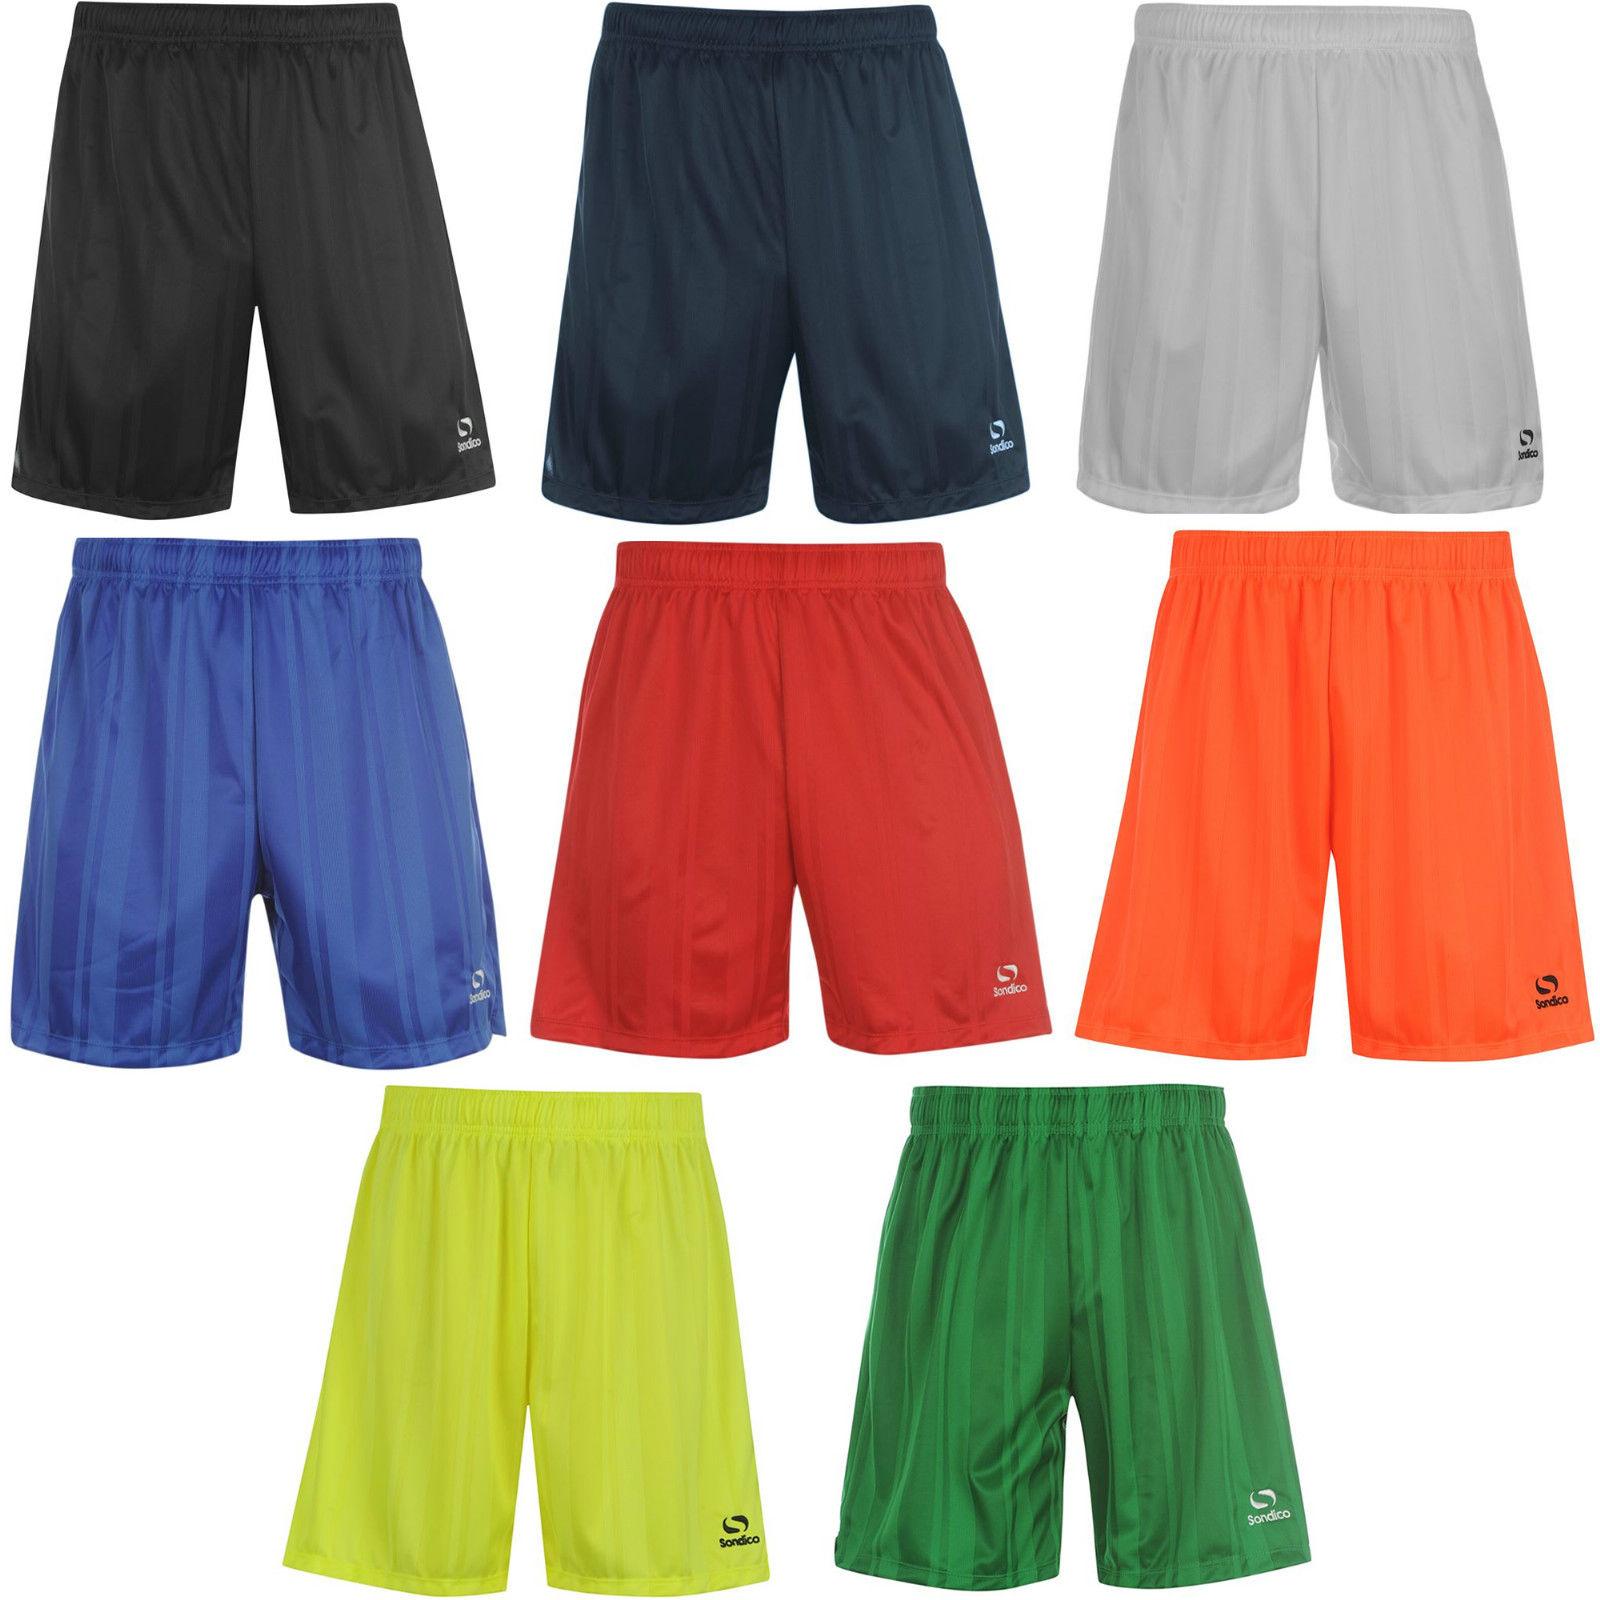 SONDICO Herren Fußballshorts Fußball Shorts kurze Hose Bermuda Polo Sport Shirt